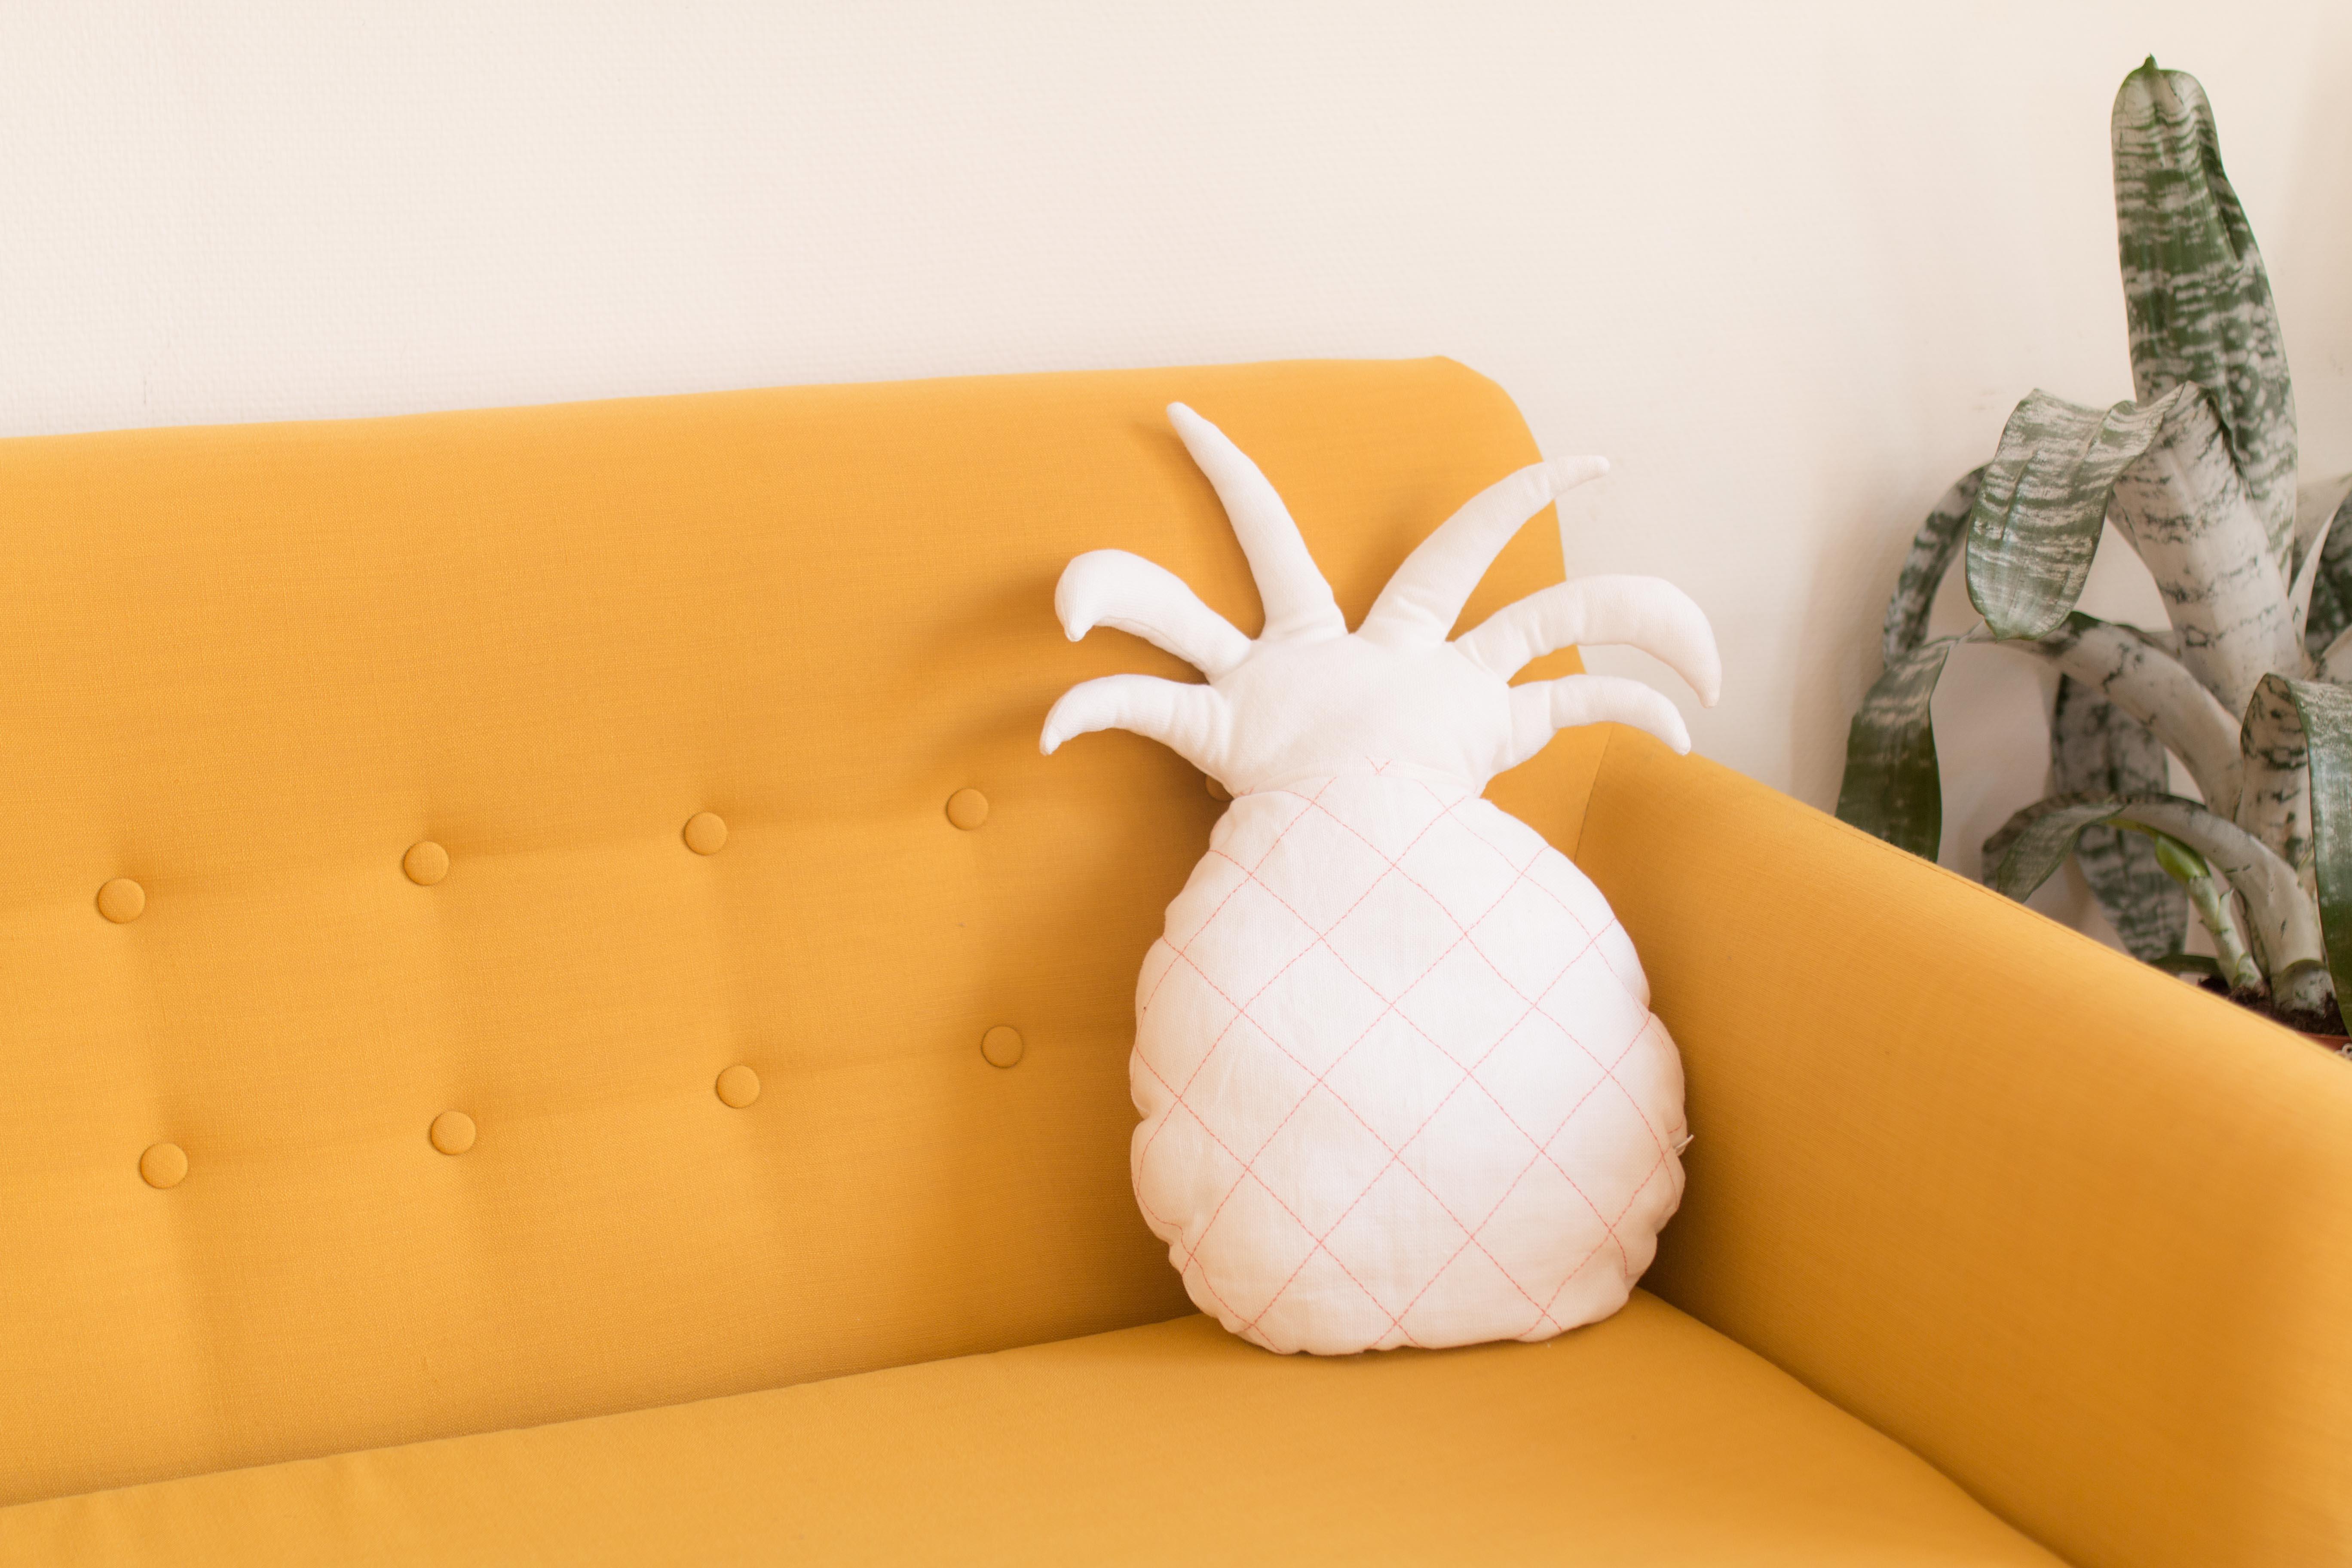 deco-de-mon-salon-home-cute-sweet-home-i-sp4nkblog-6